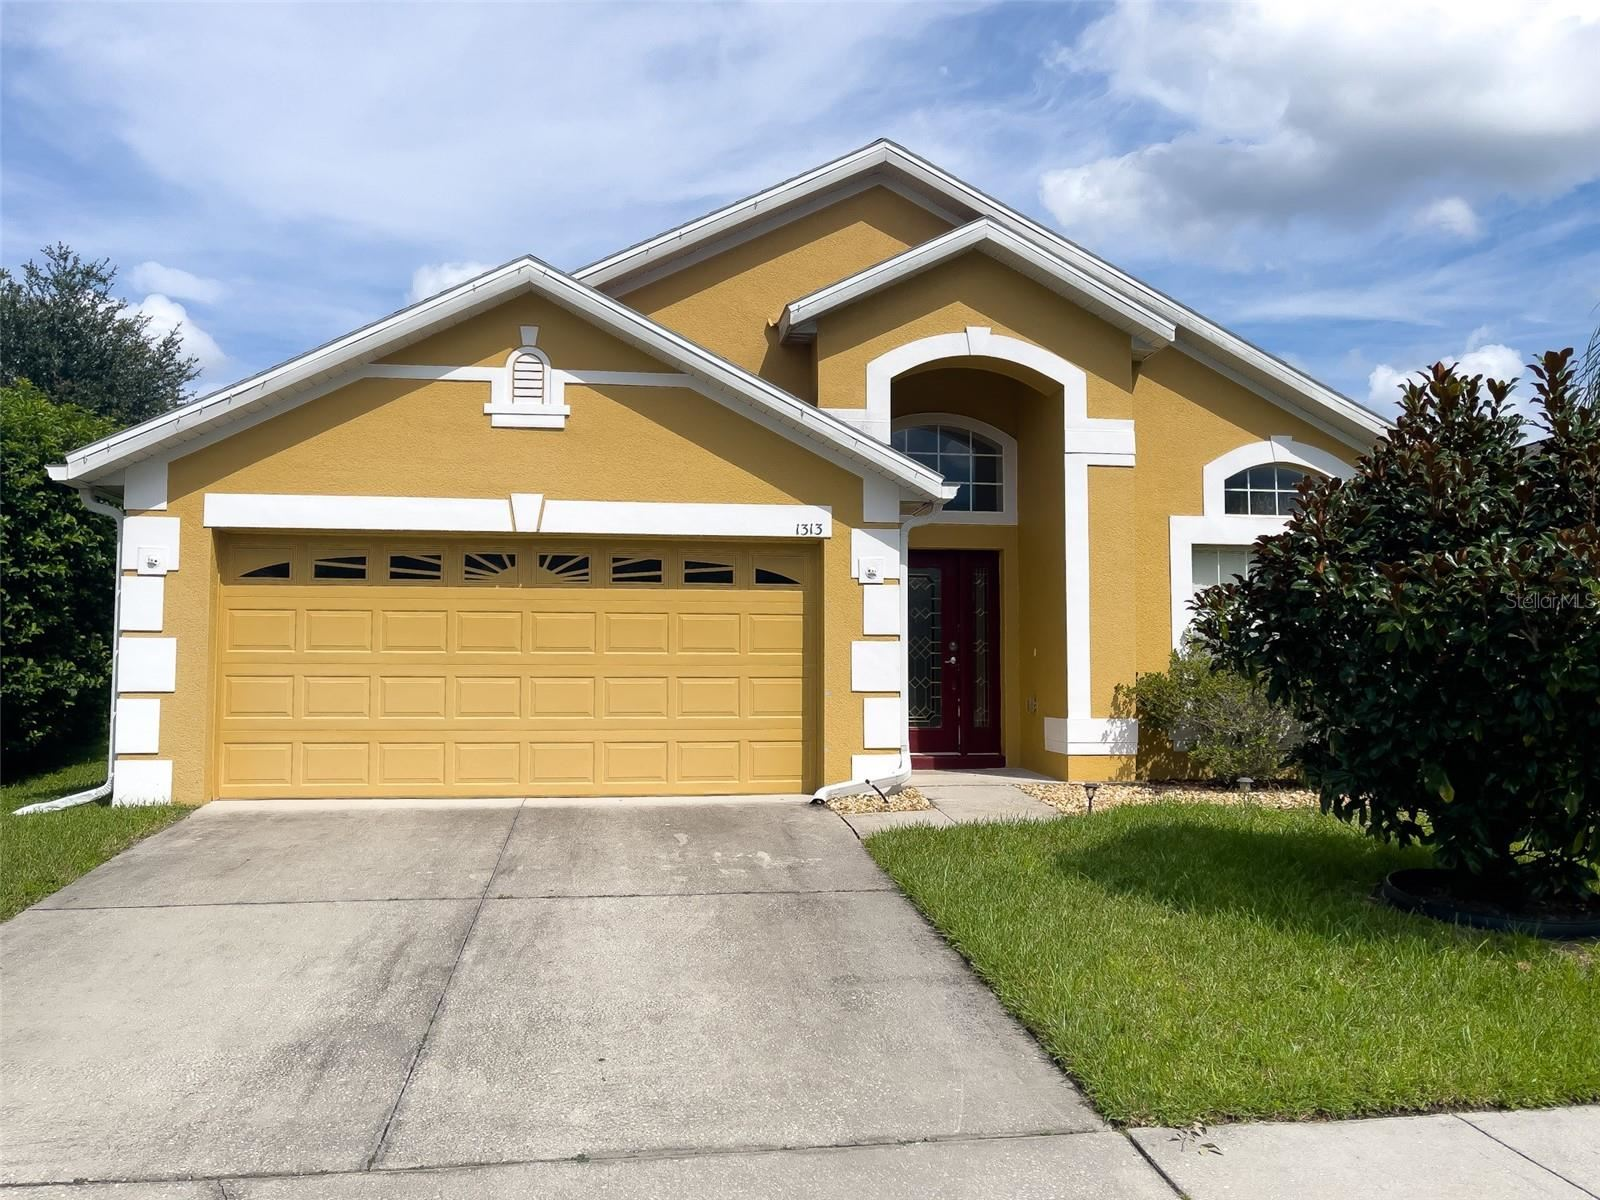 1313 WILLOW BRANCH DRIVE, Orlando, FL 32828 - #: O5957930